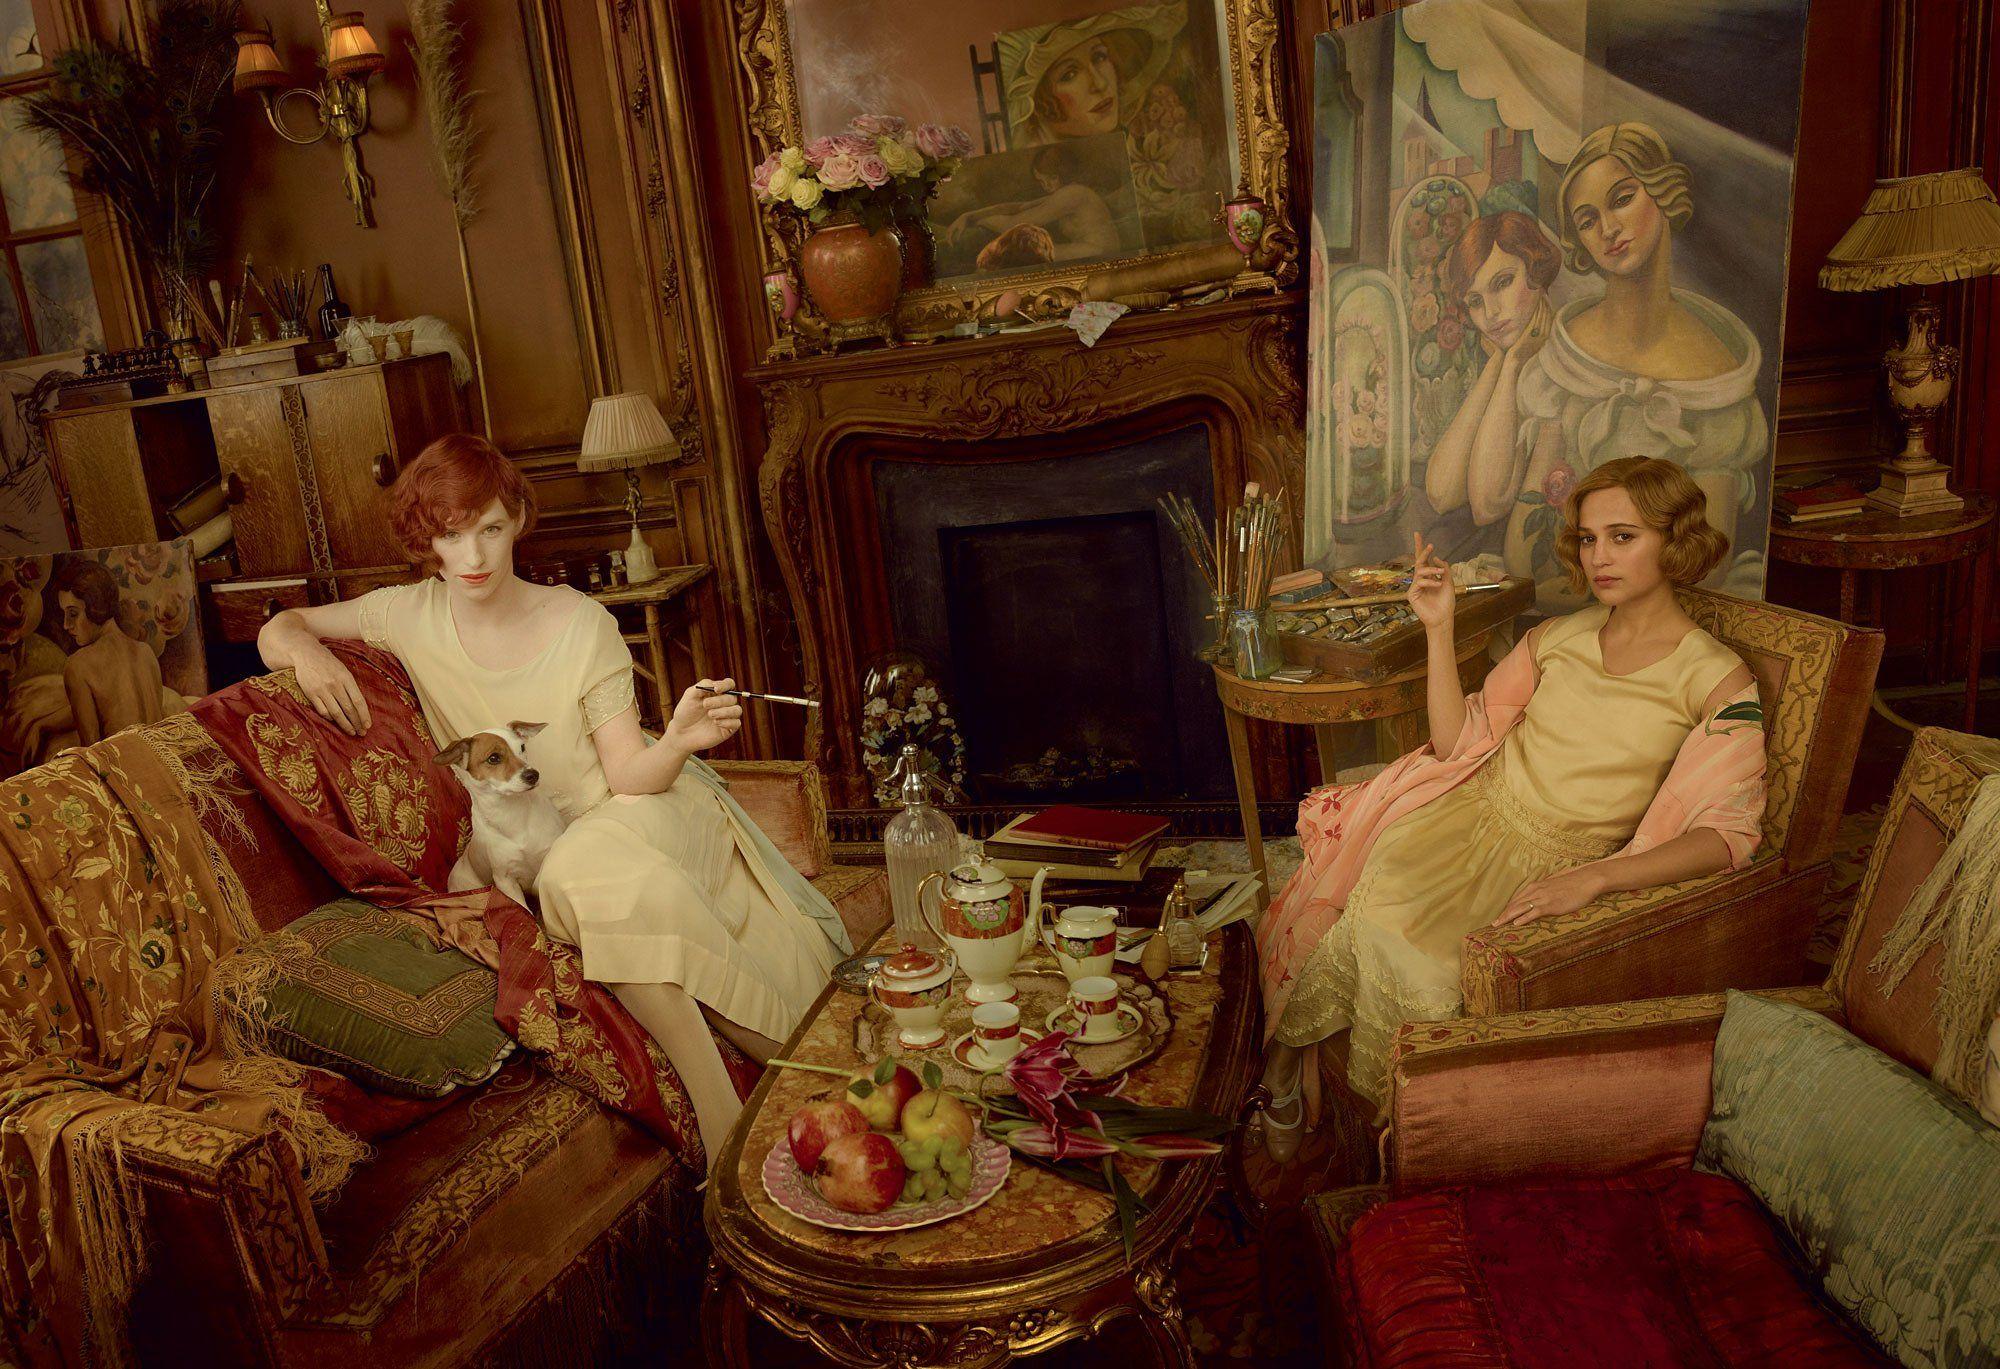 The Real Story Behind The Paintings In The Danish Girl Pinturas Para Niñas Annie Leibovitz La Chica Danesa